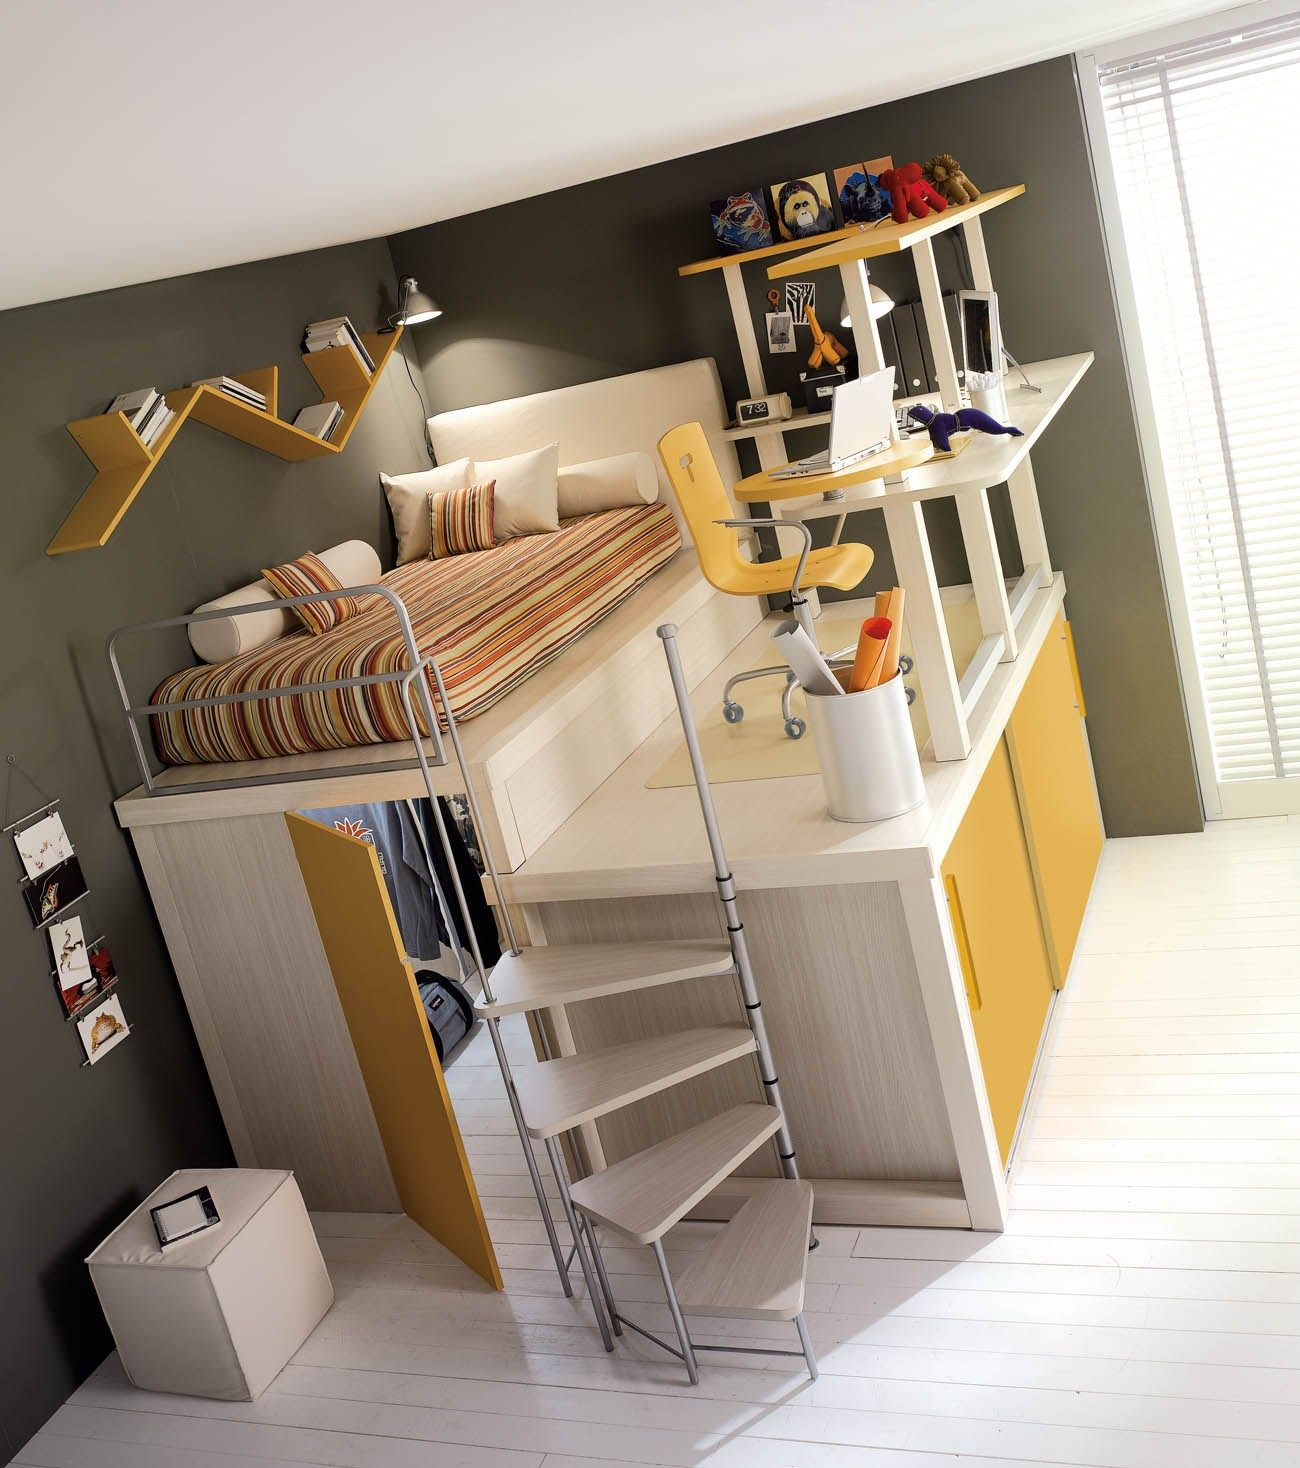 schlafzimmer f r jugendliche tiramolla 182 tumidei schlafzimmer pinterest jugendliche. Black Bedroom Furniture Sets. Home Design Ideas